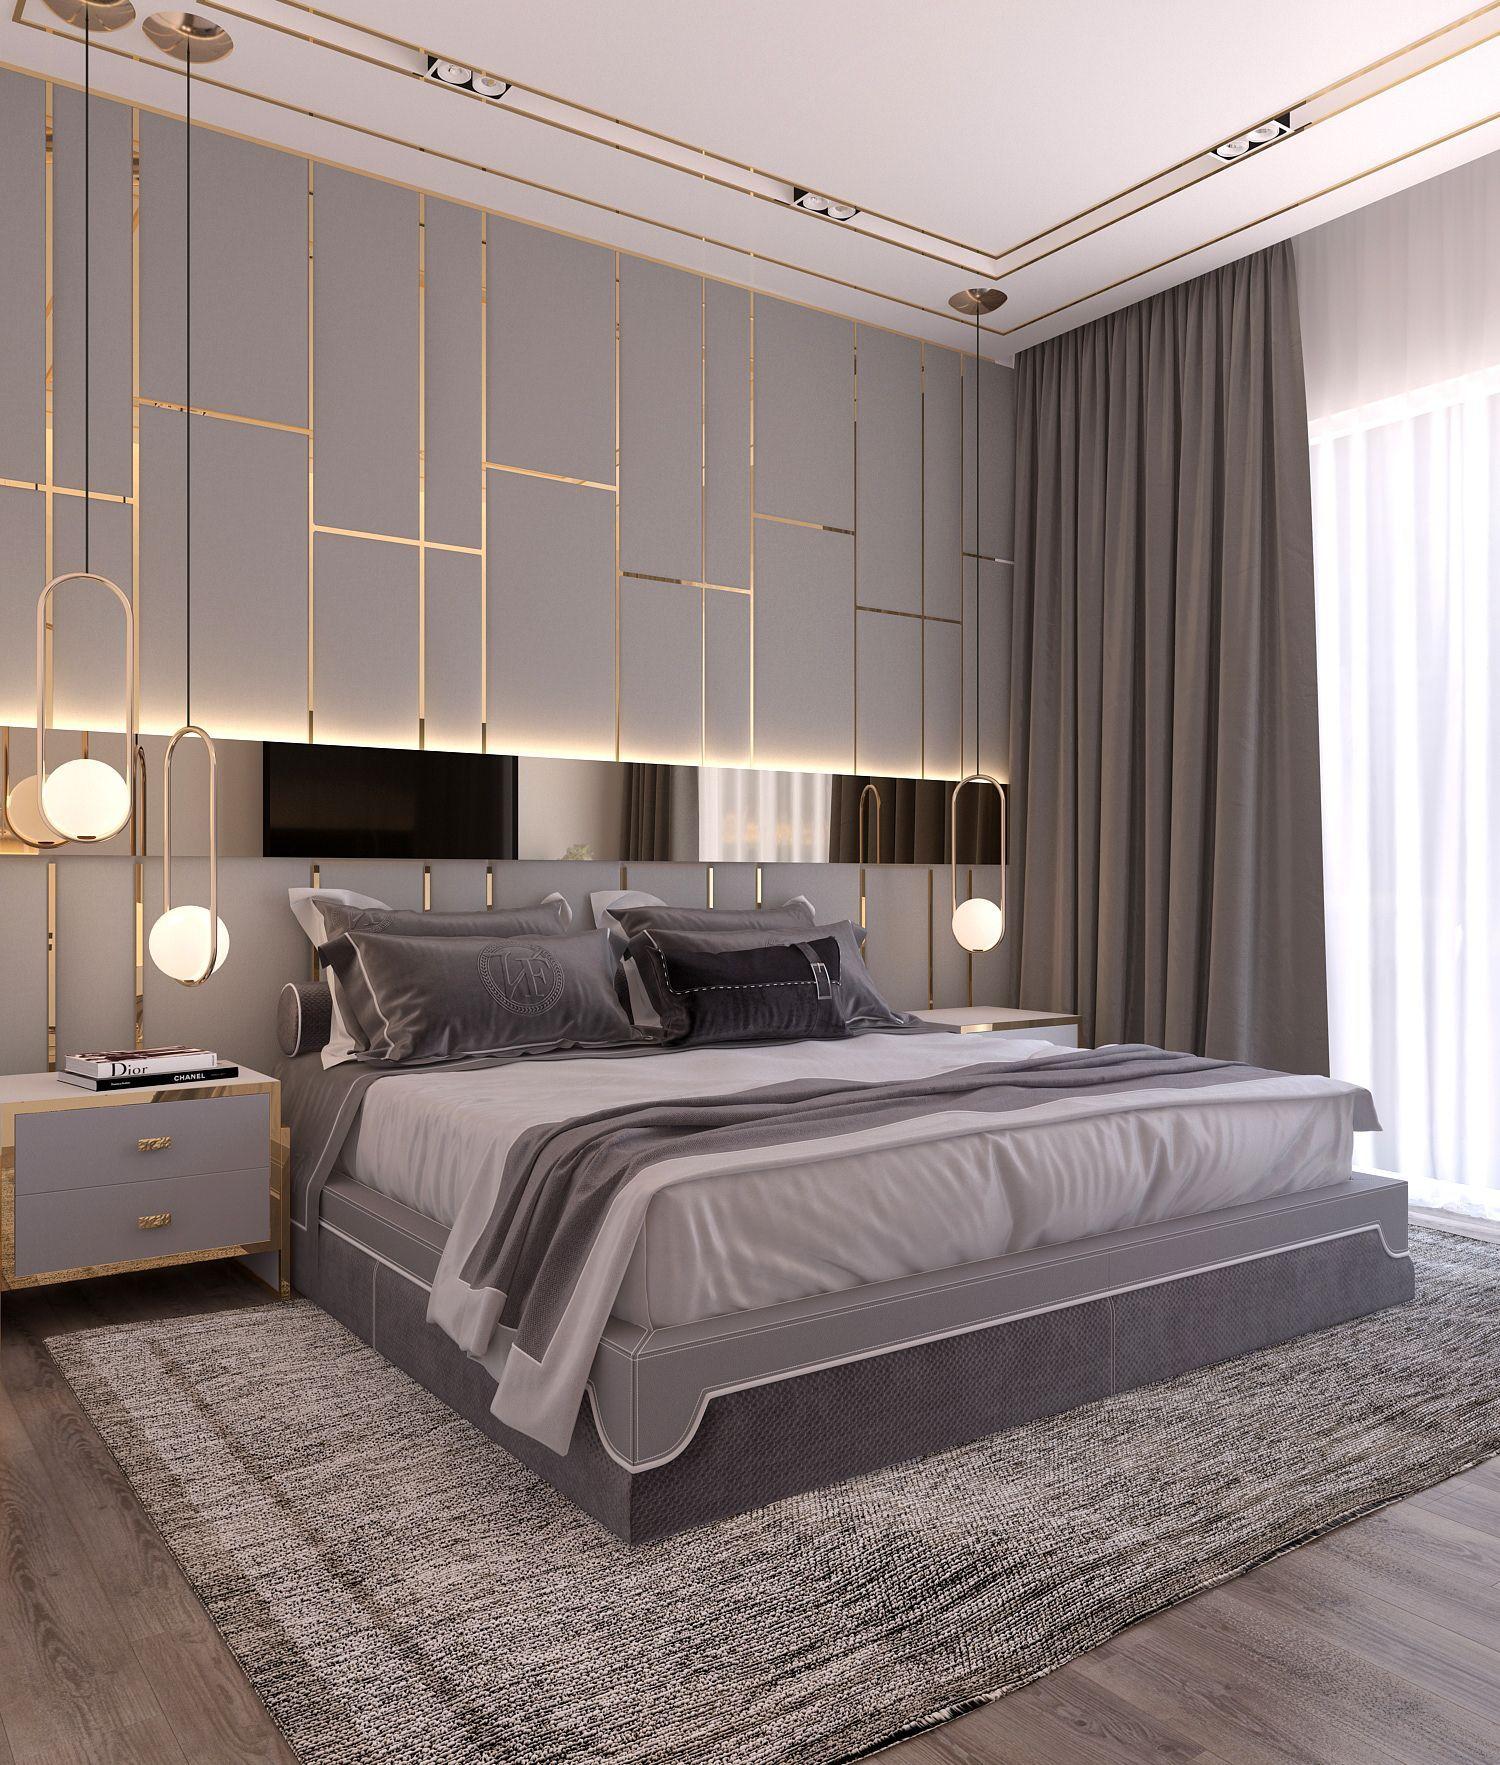 Amazing Modern Bedroom Design Ideas 05